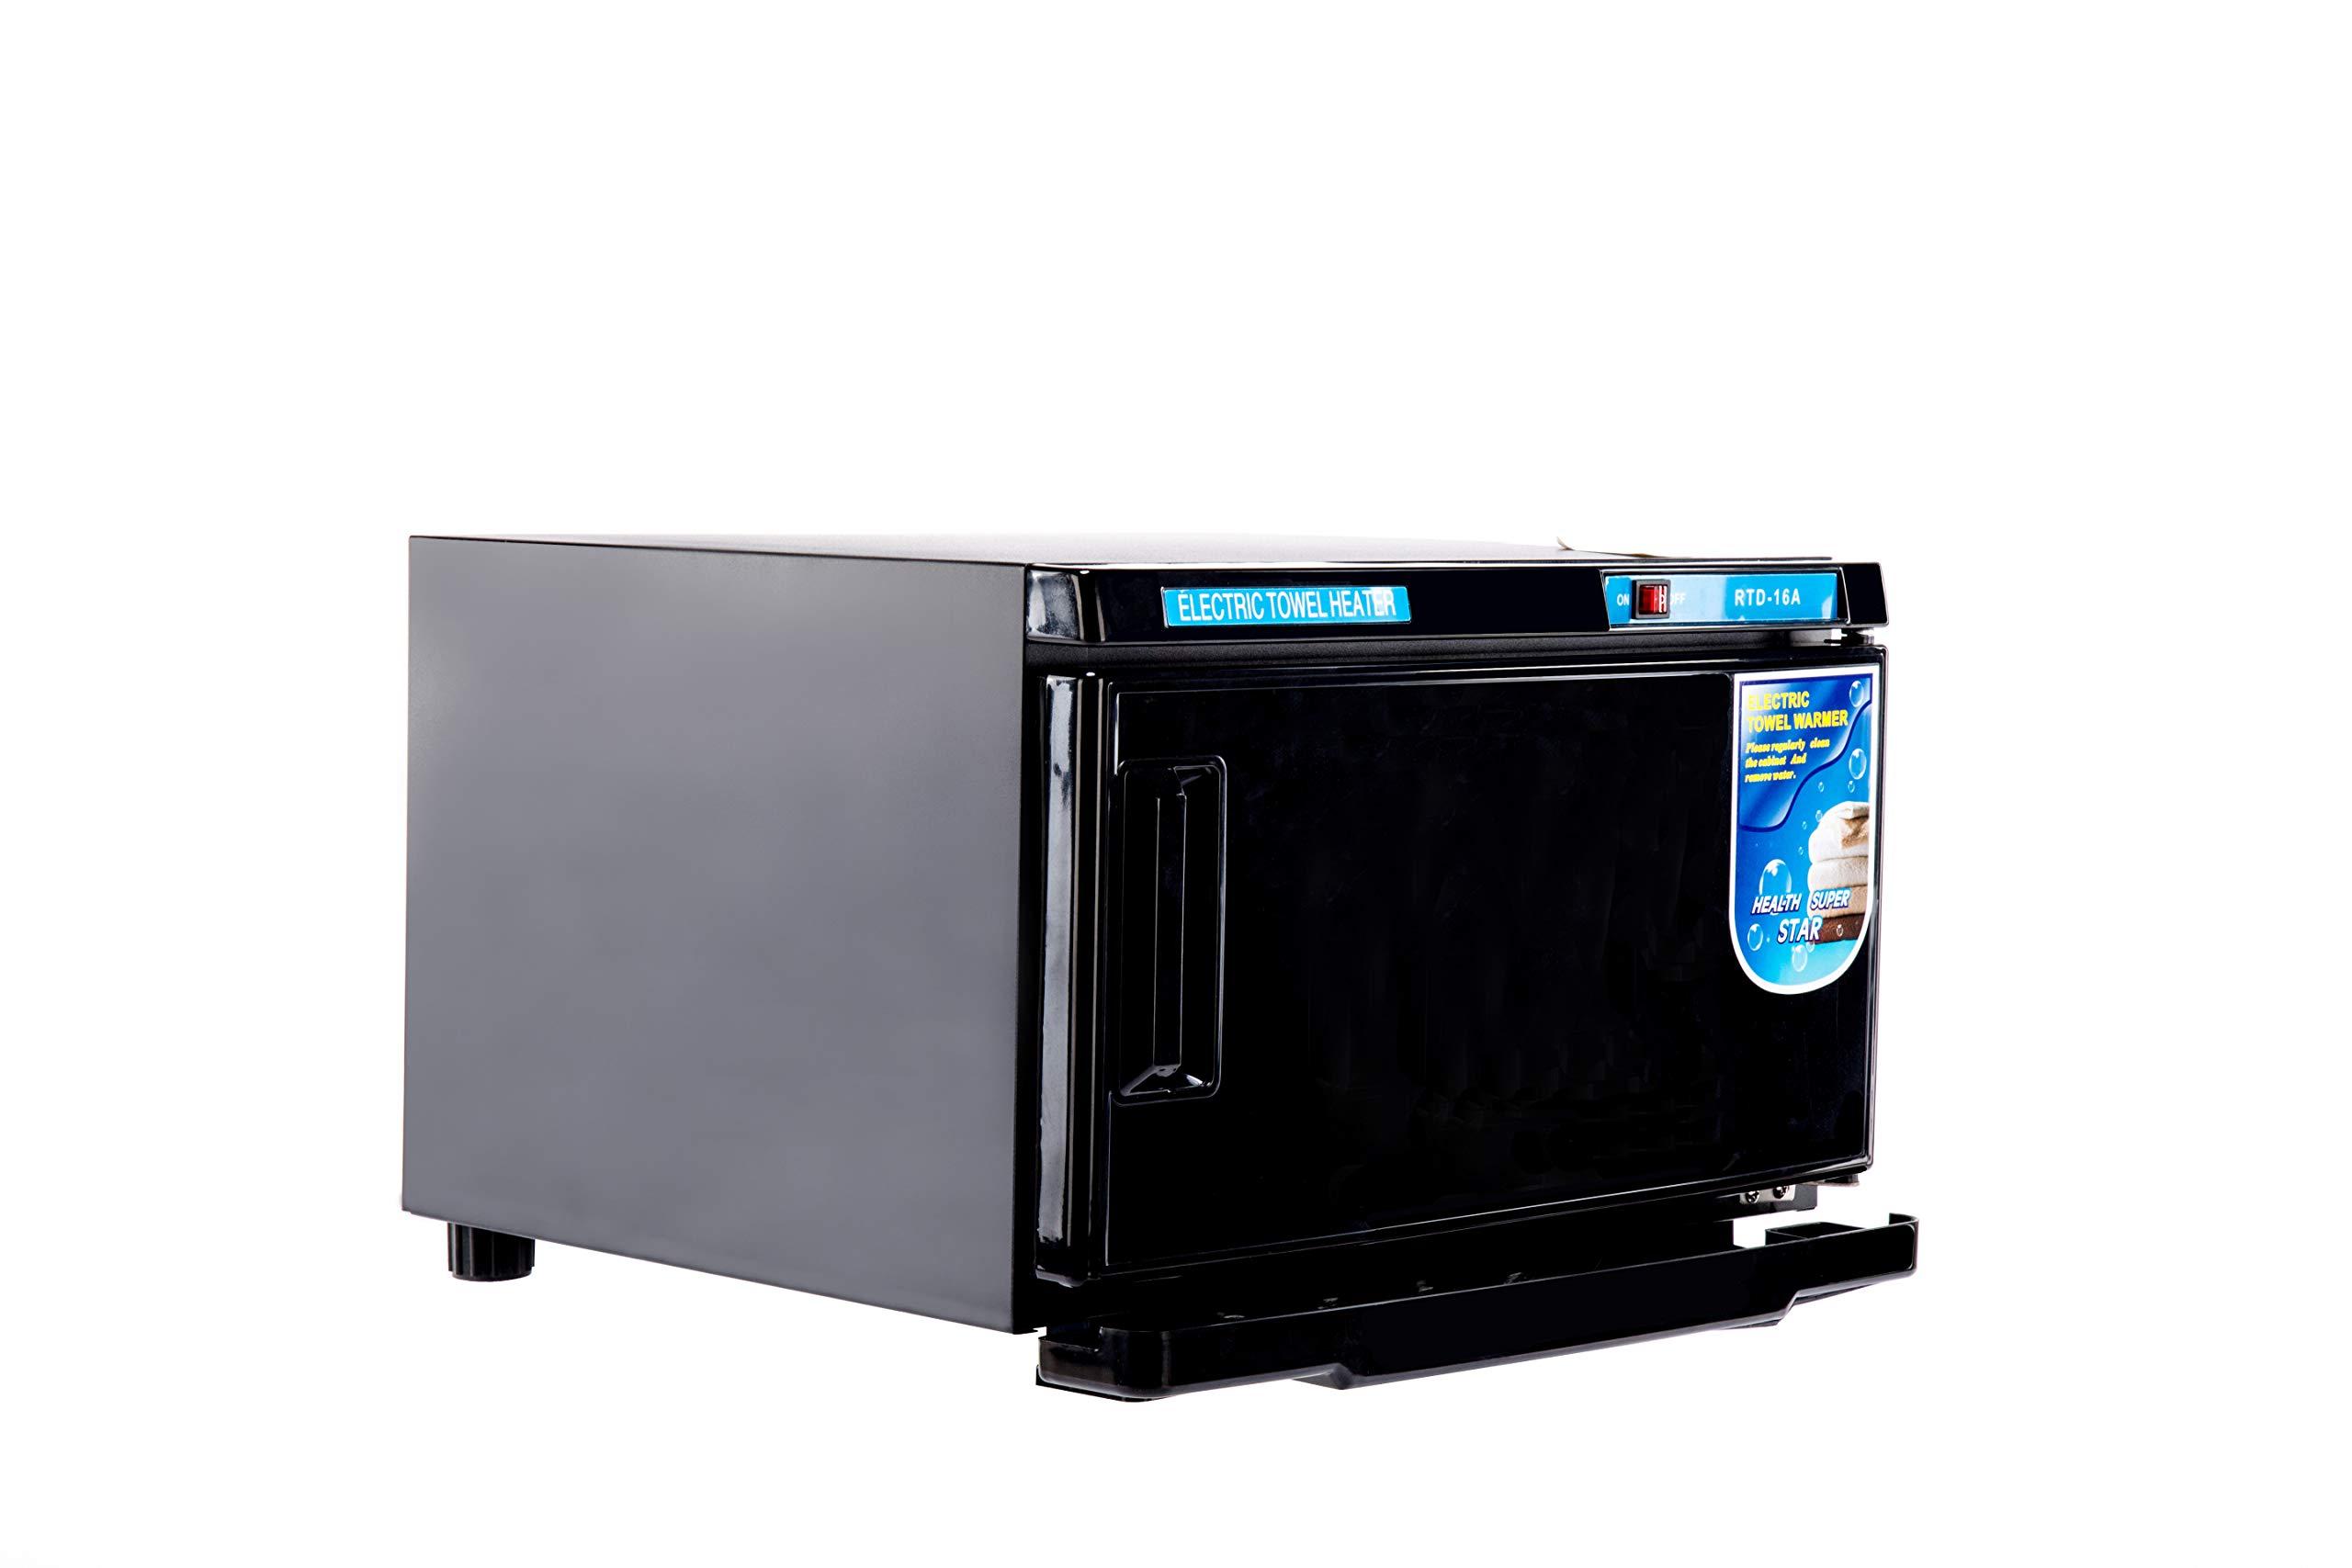 Barberpub 2in1 16L UV Sterilizer Hot Towel Warmer Cabinet Facial Skin Spa Massage Hair Beauty Salon Equipment TS05 (Black) by BarberPub (Image #1)